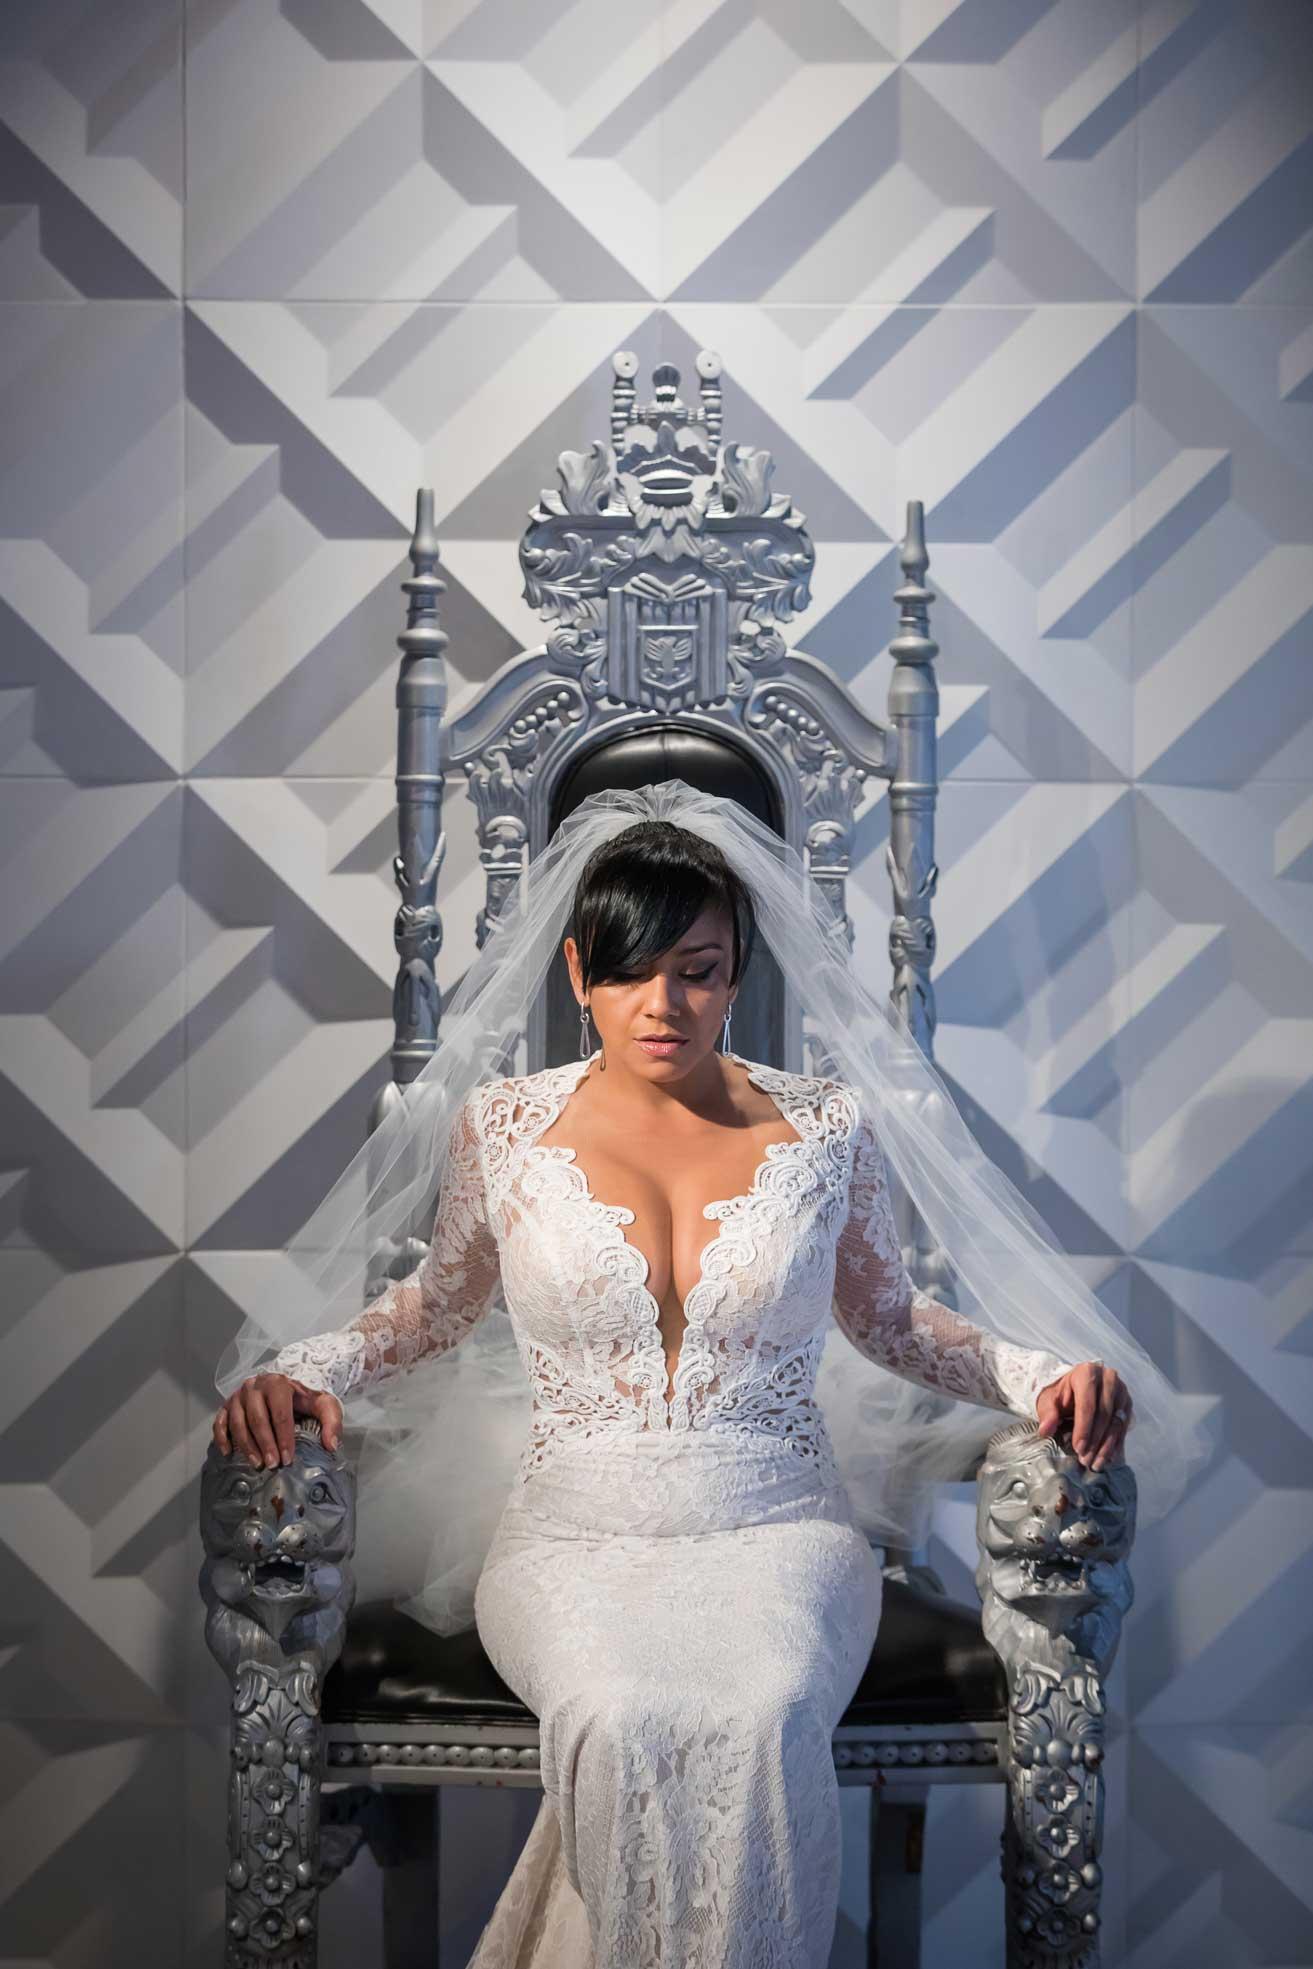 the-venue-fortlauderdale-crystalballroom-bride (1).jpg